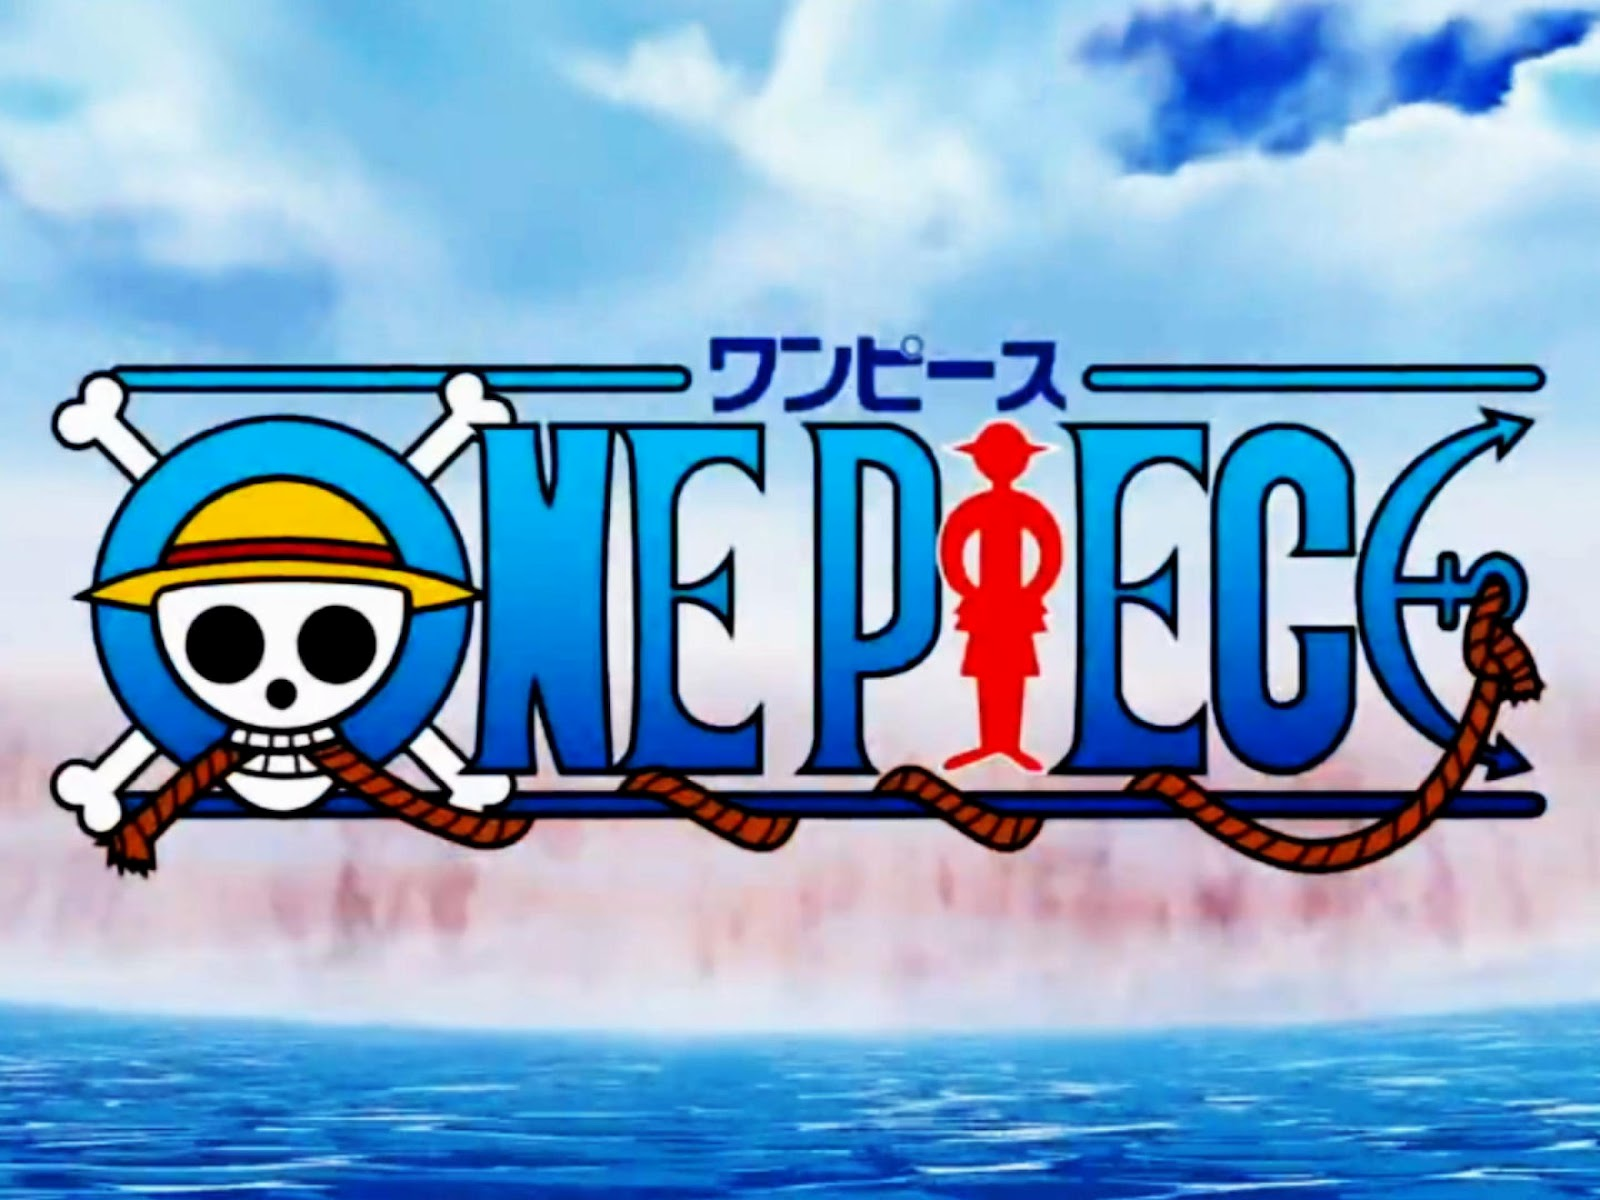 One Piece Wallpaper One Piece Logo Wallpaper 1600x1200